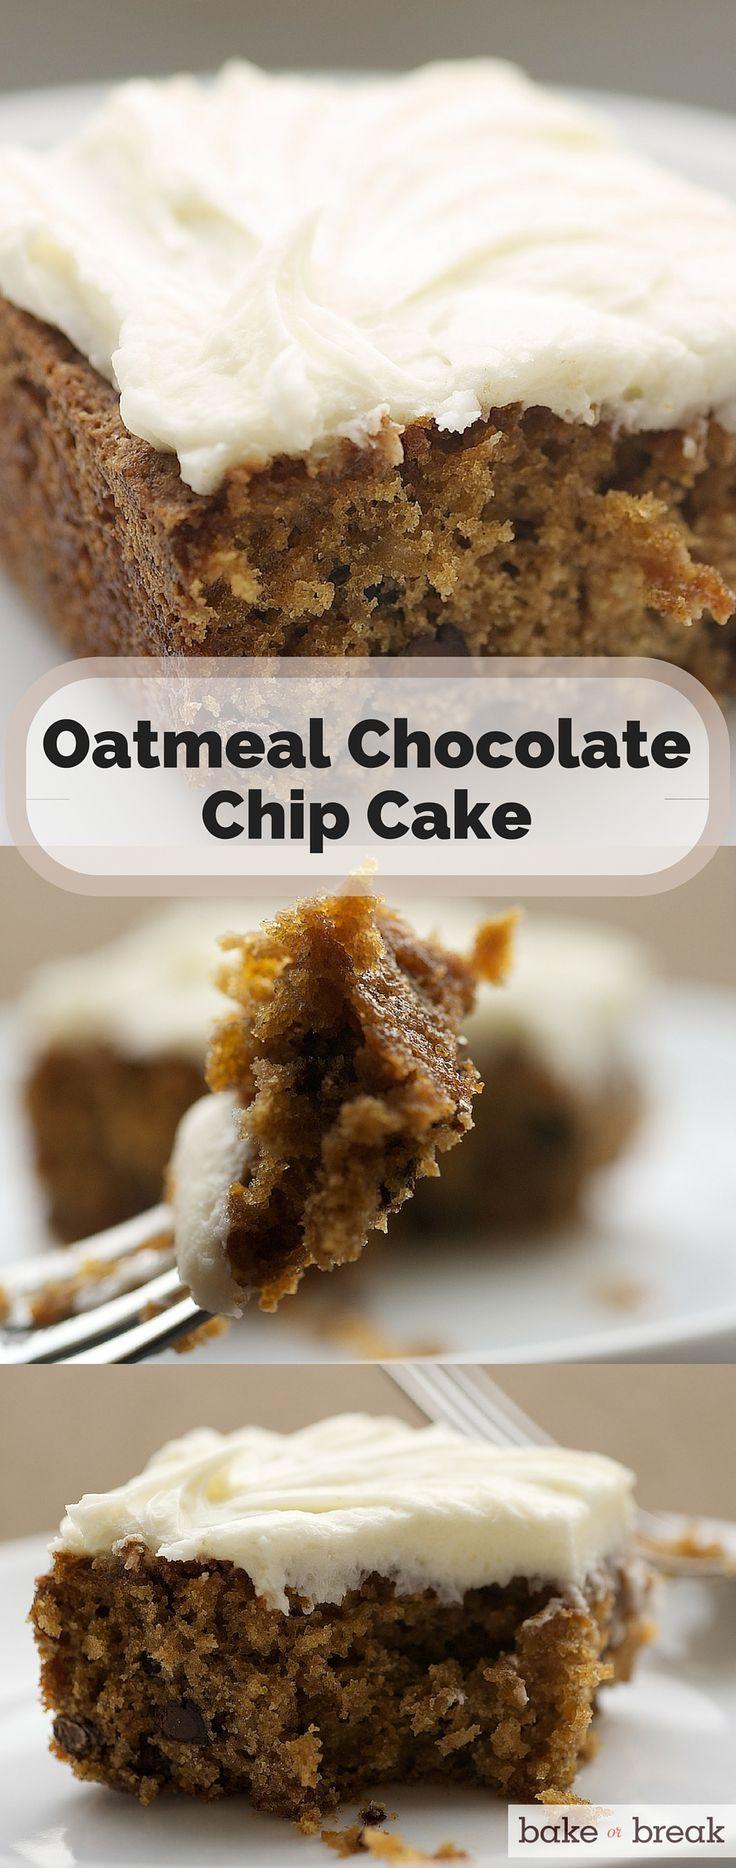 Oatmeal Chocolate Chip Cake | Recipe | Cream cheeses, Chocolate chips ...